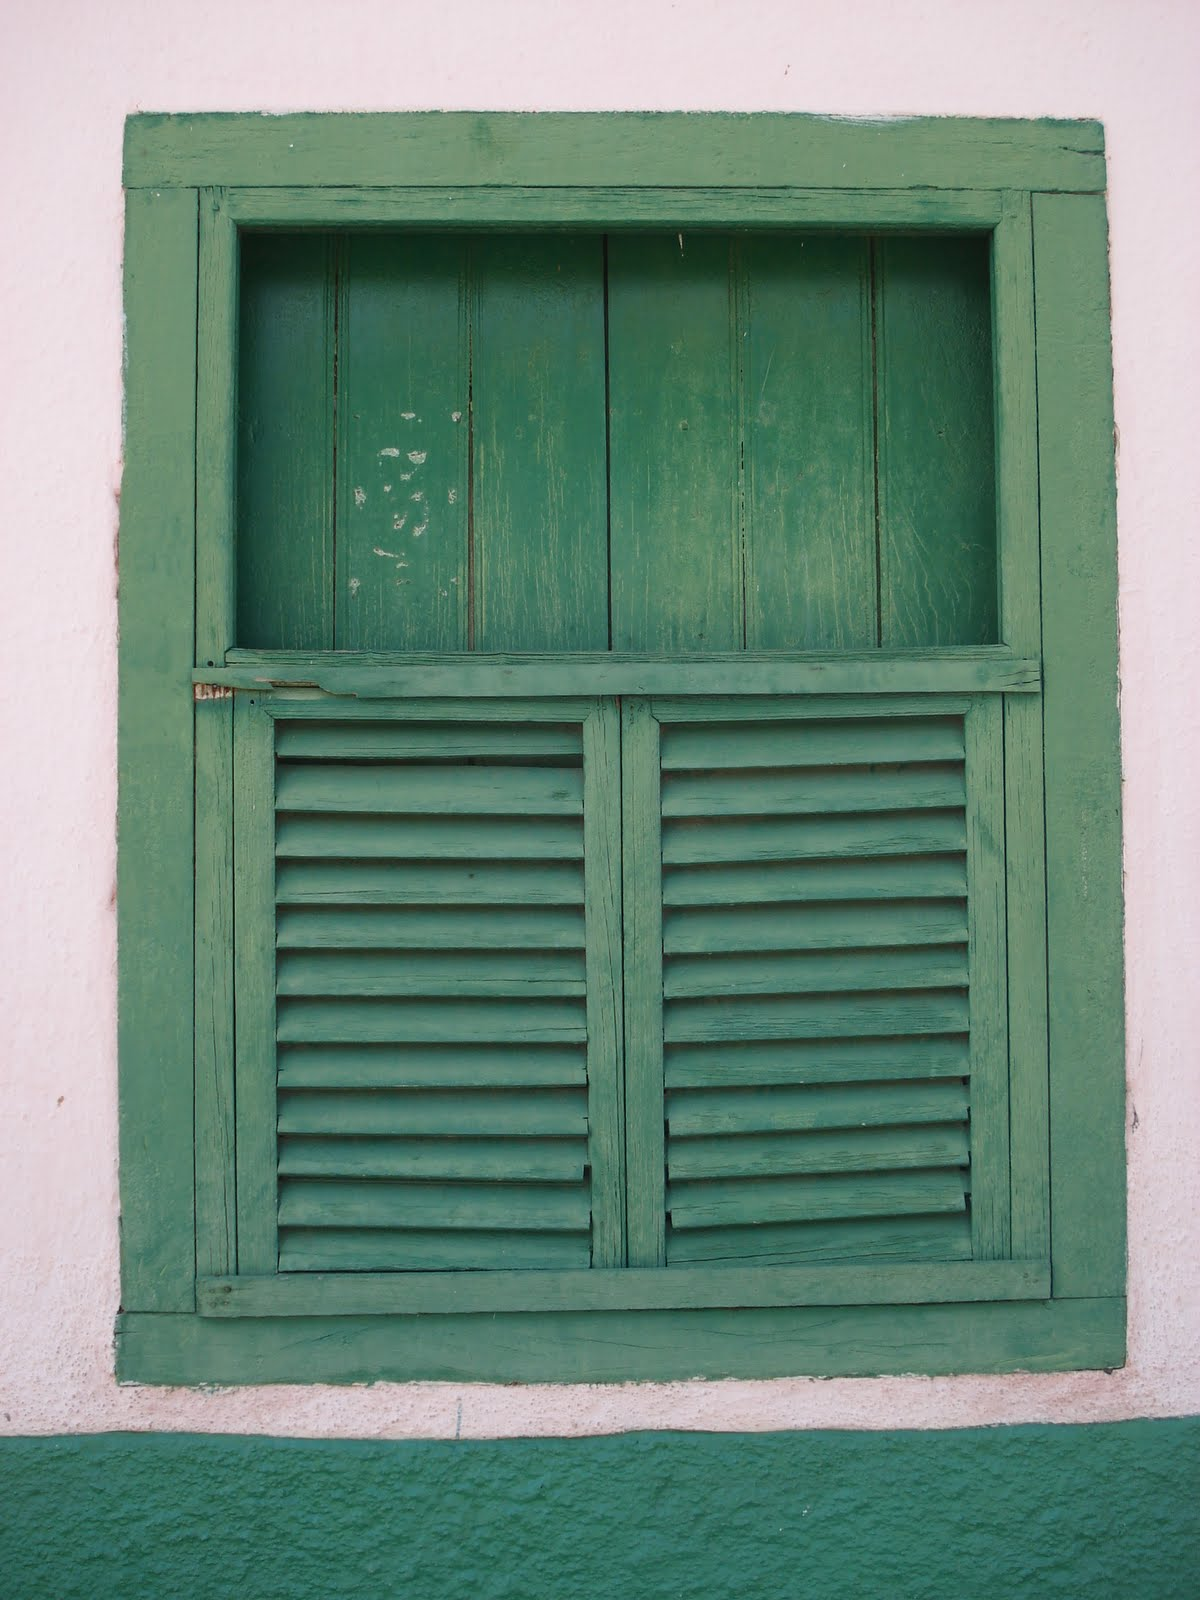 #33634C KAKI AFONSO Arquitetura: Janelas da arquitetura piauiense: Amarante. 570 Janelas Em Arco Pleno